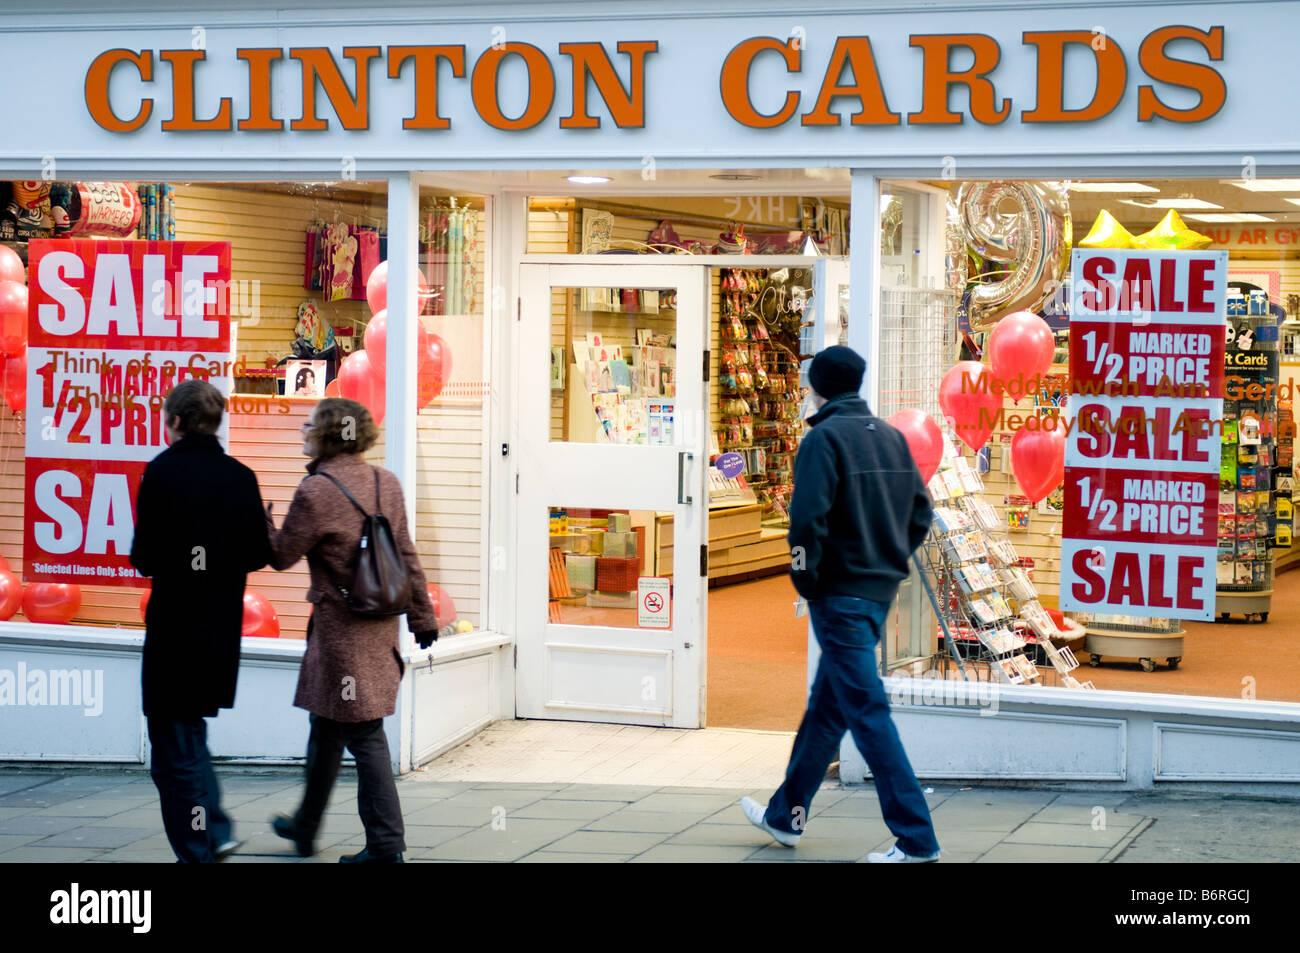 Clinton Cards Stock Photos Clinton Cards Stock Images Alamy